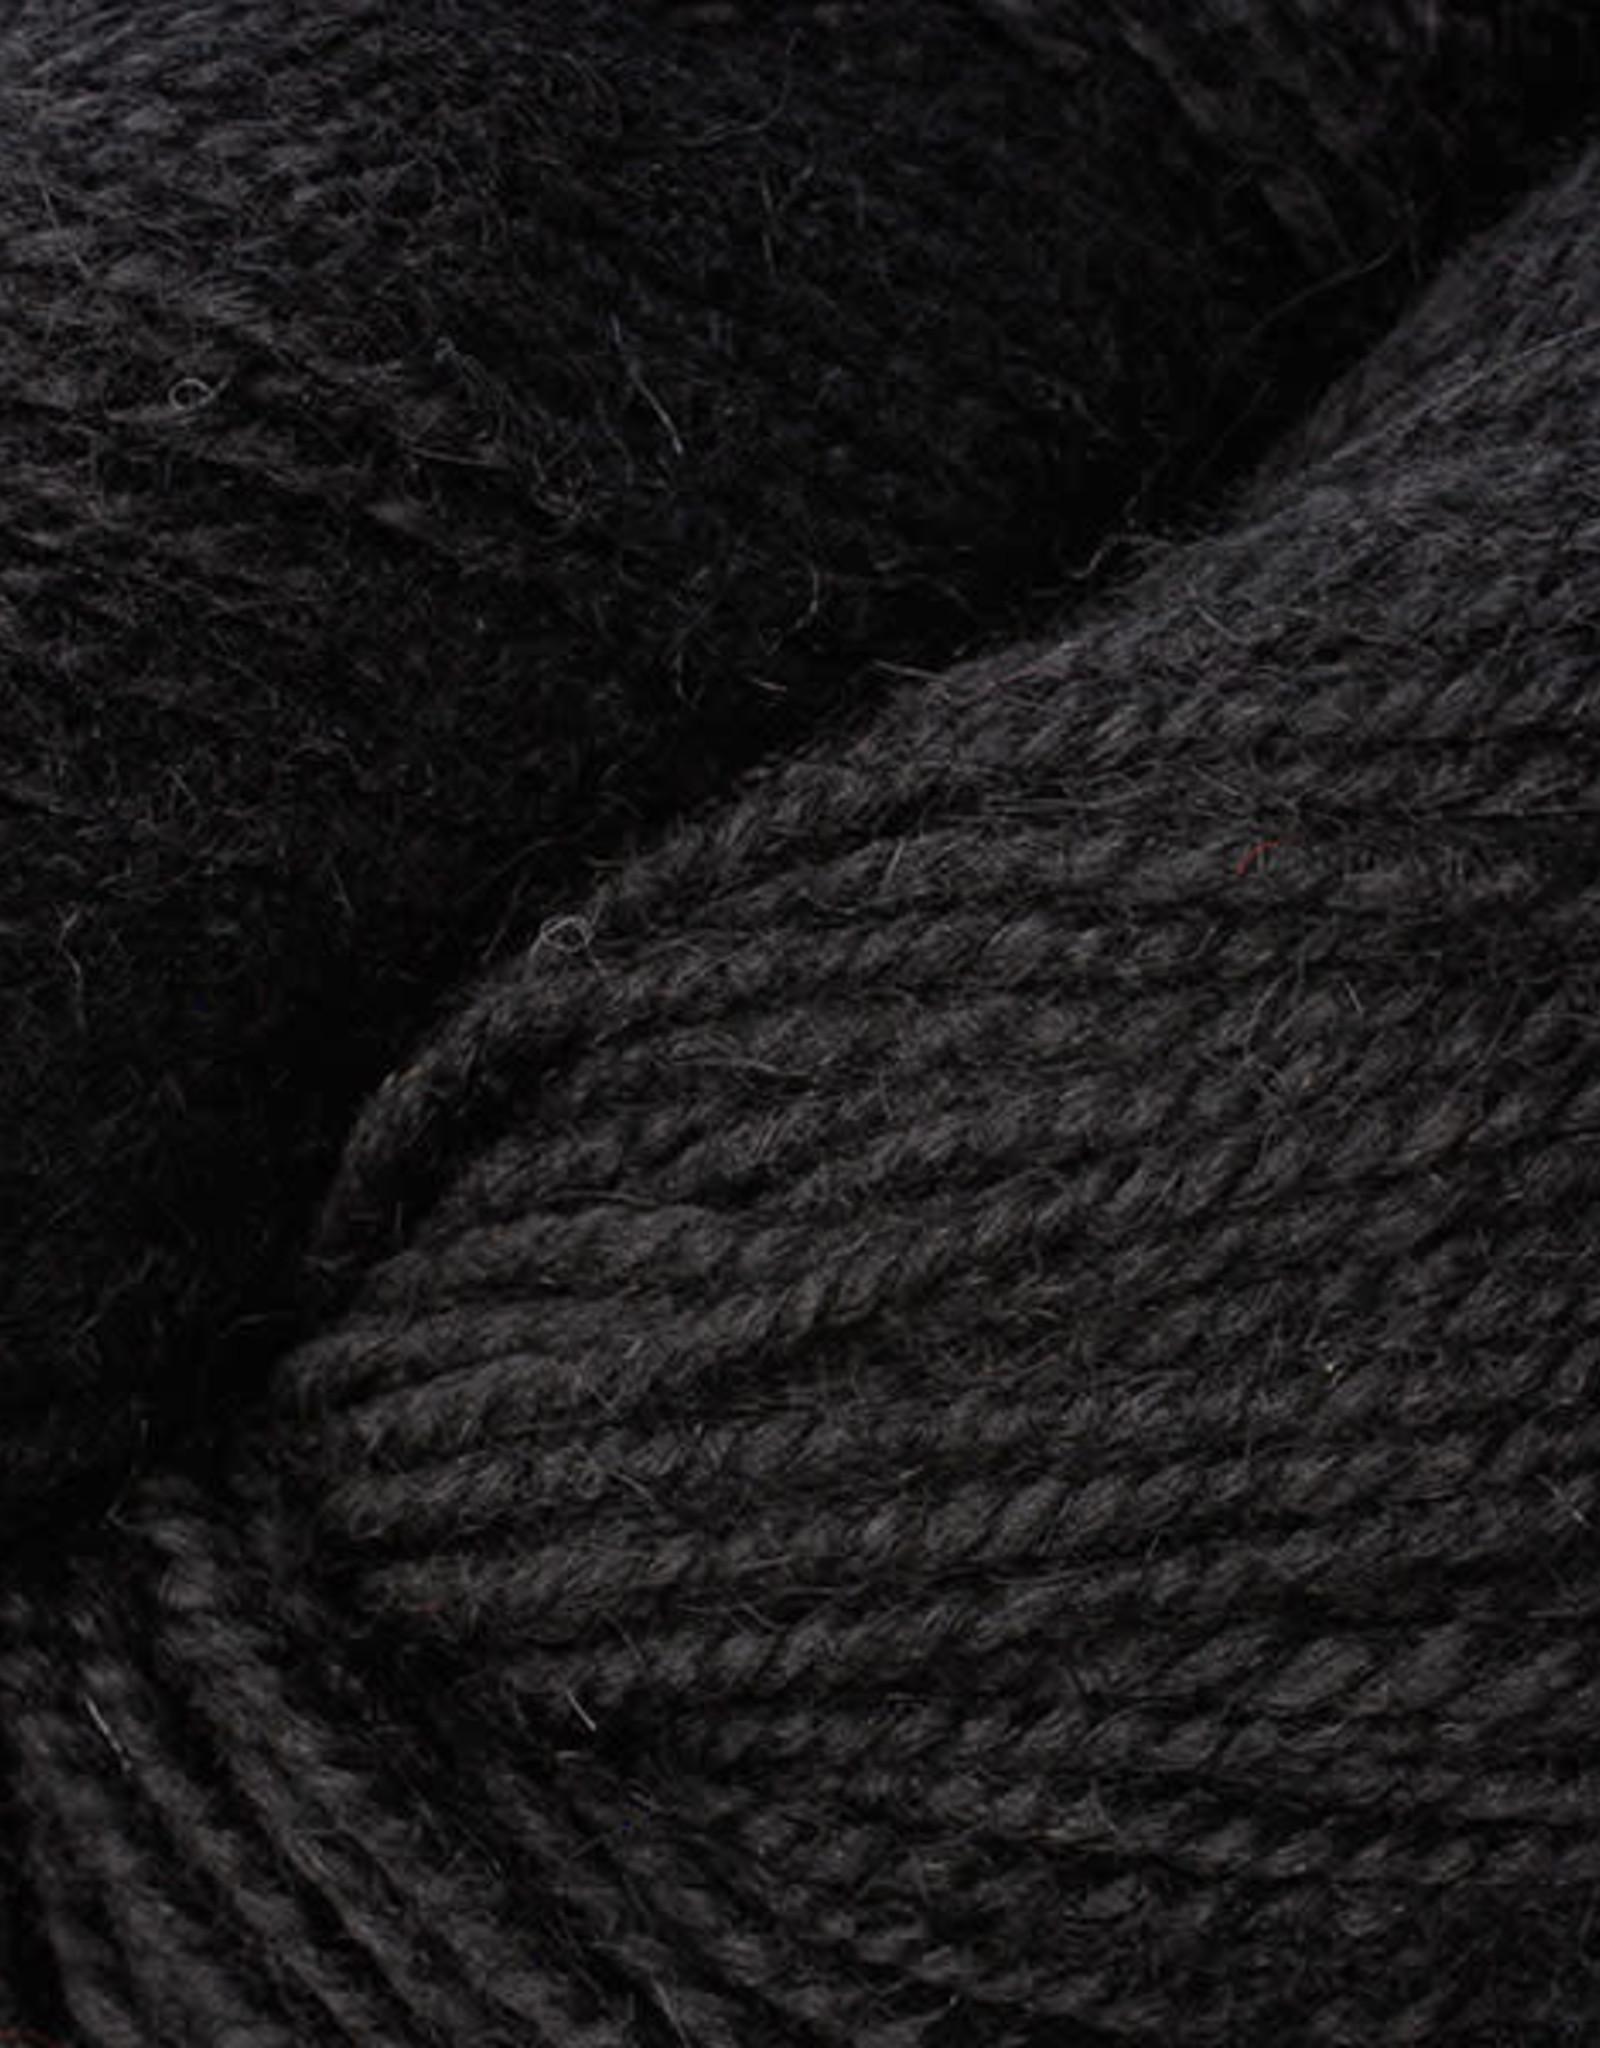 Berroco Ultra Alpaca Worst 6245 black